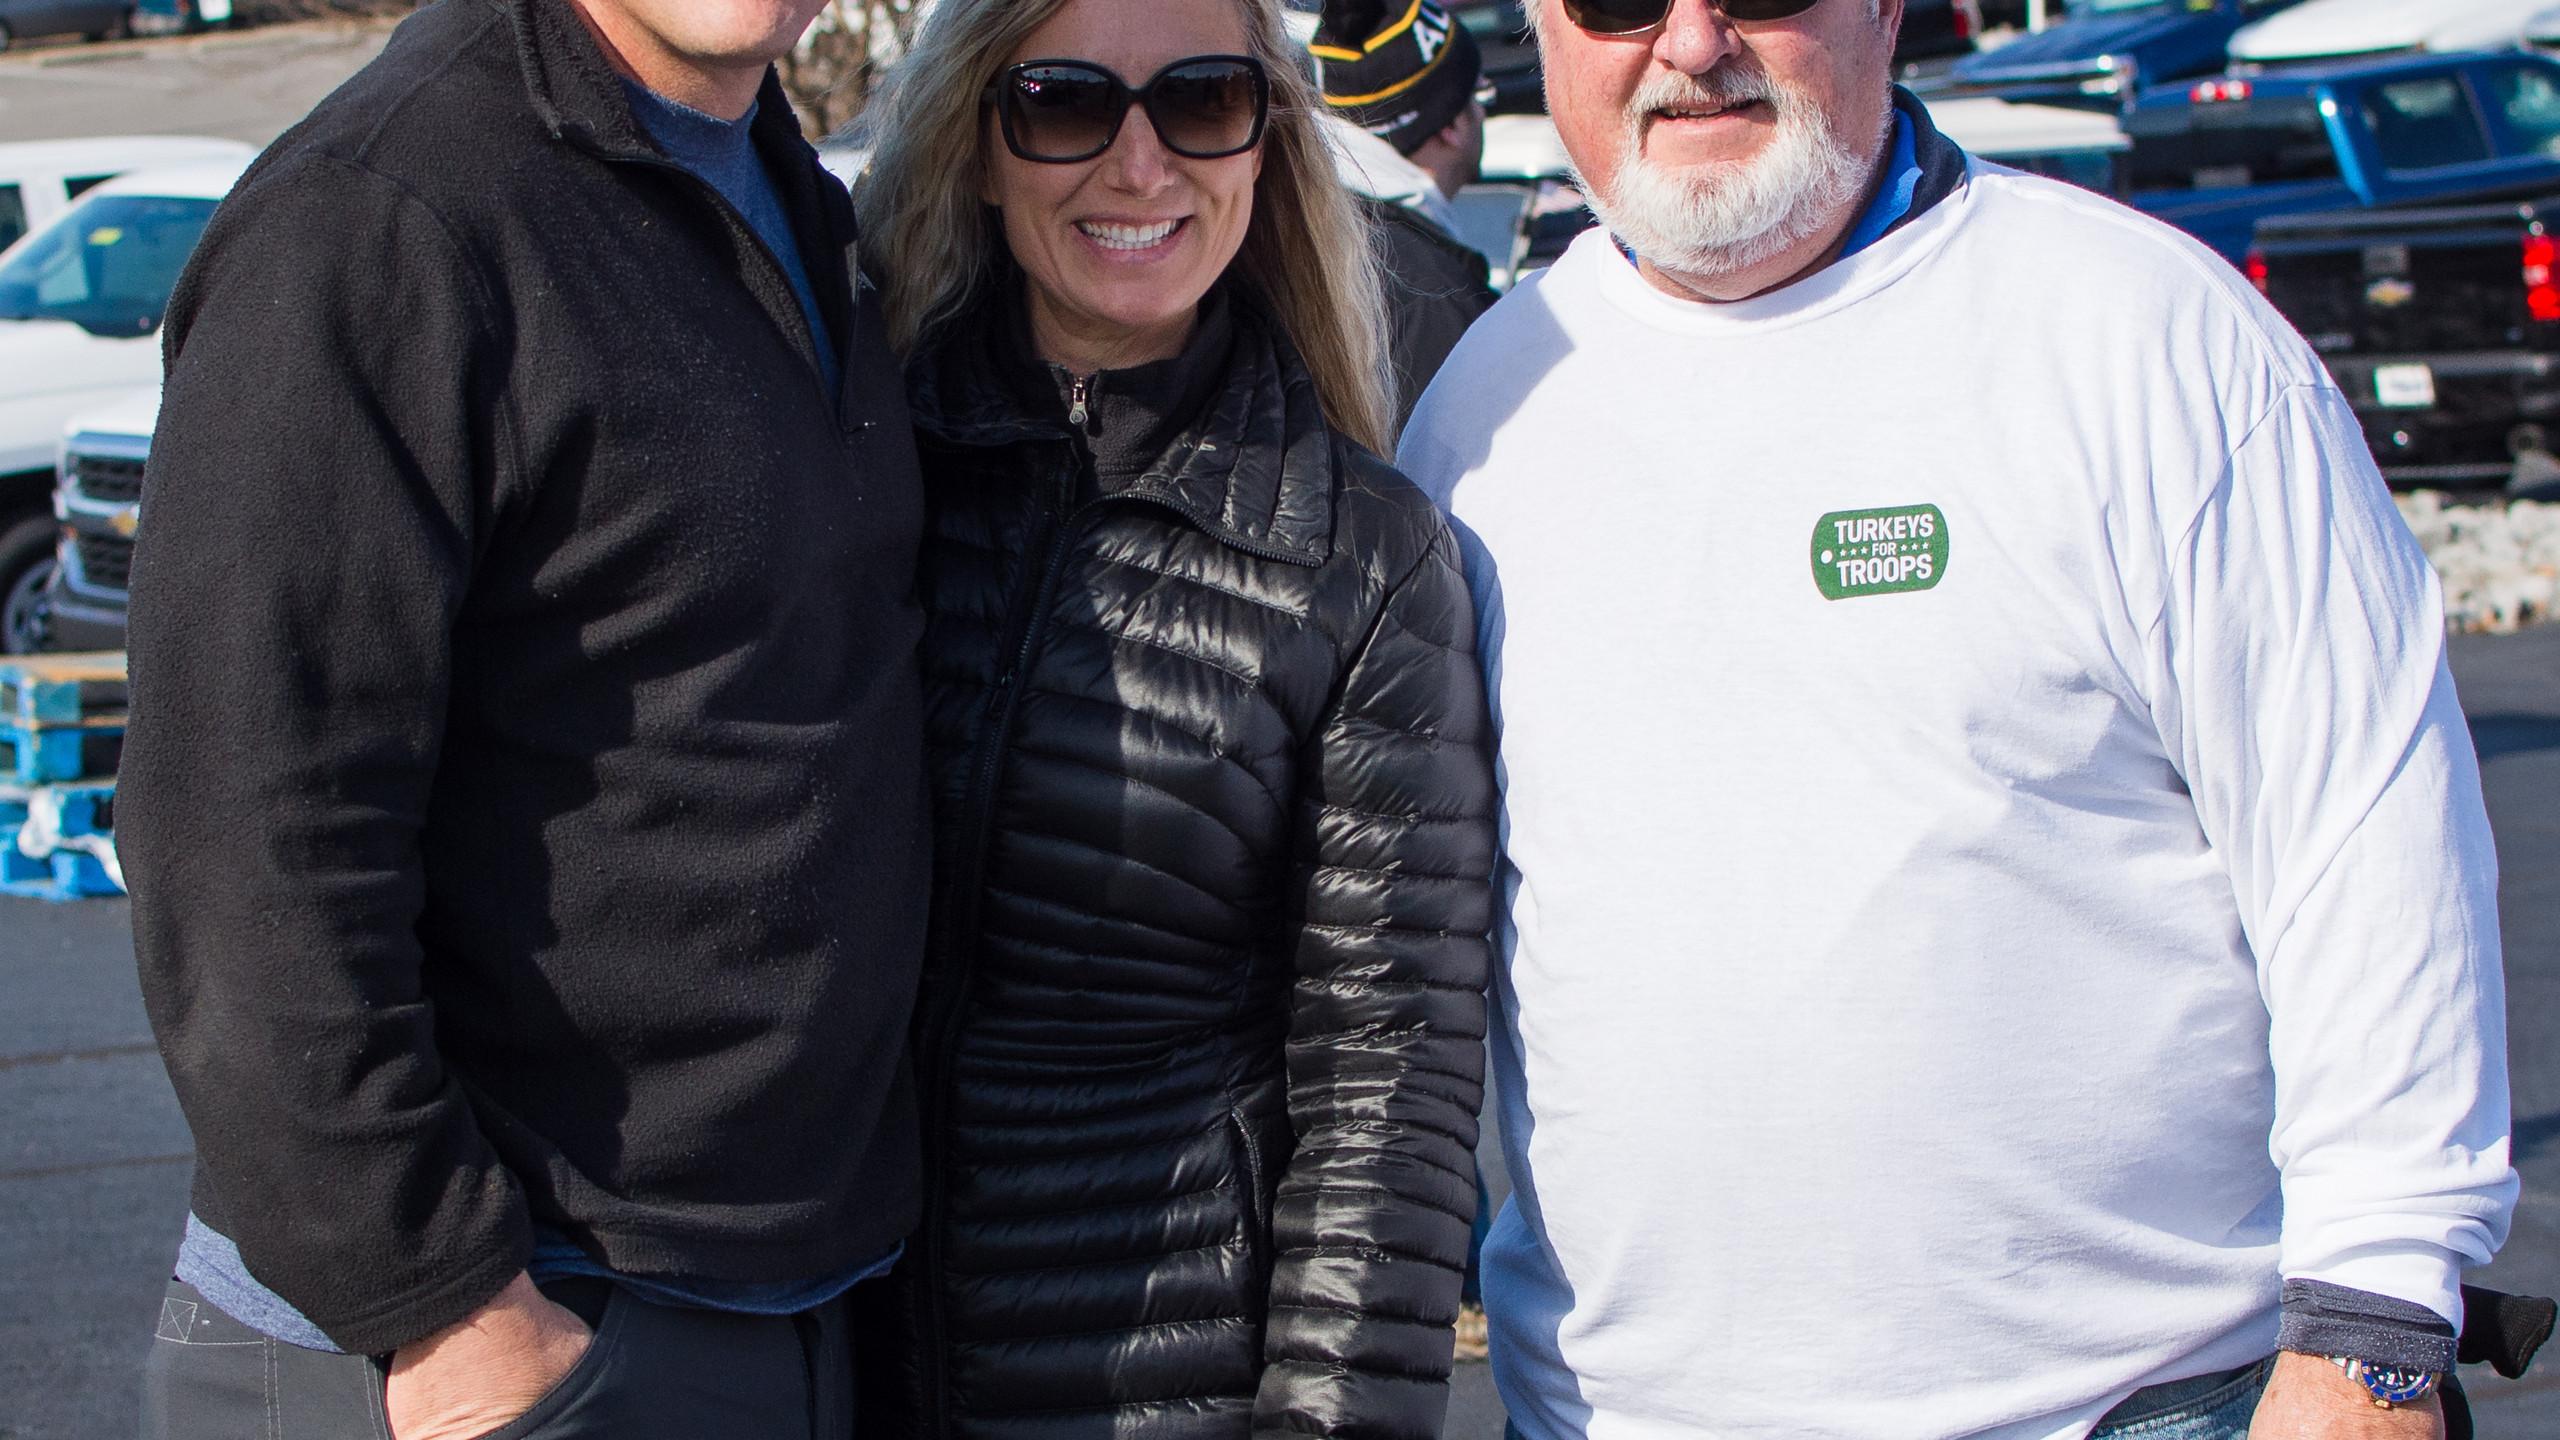 Col Joe Kuchan, Sarah Kuchan, and Sammy